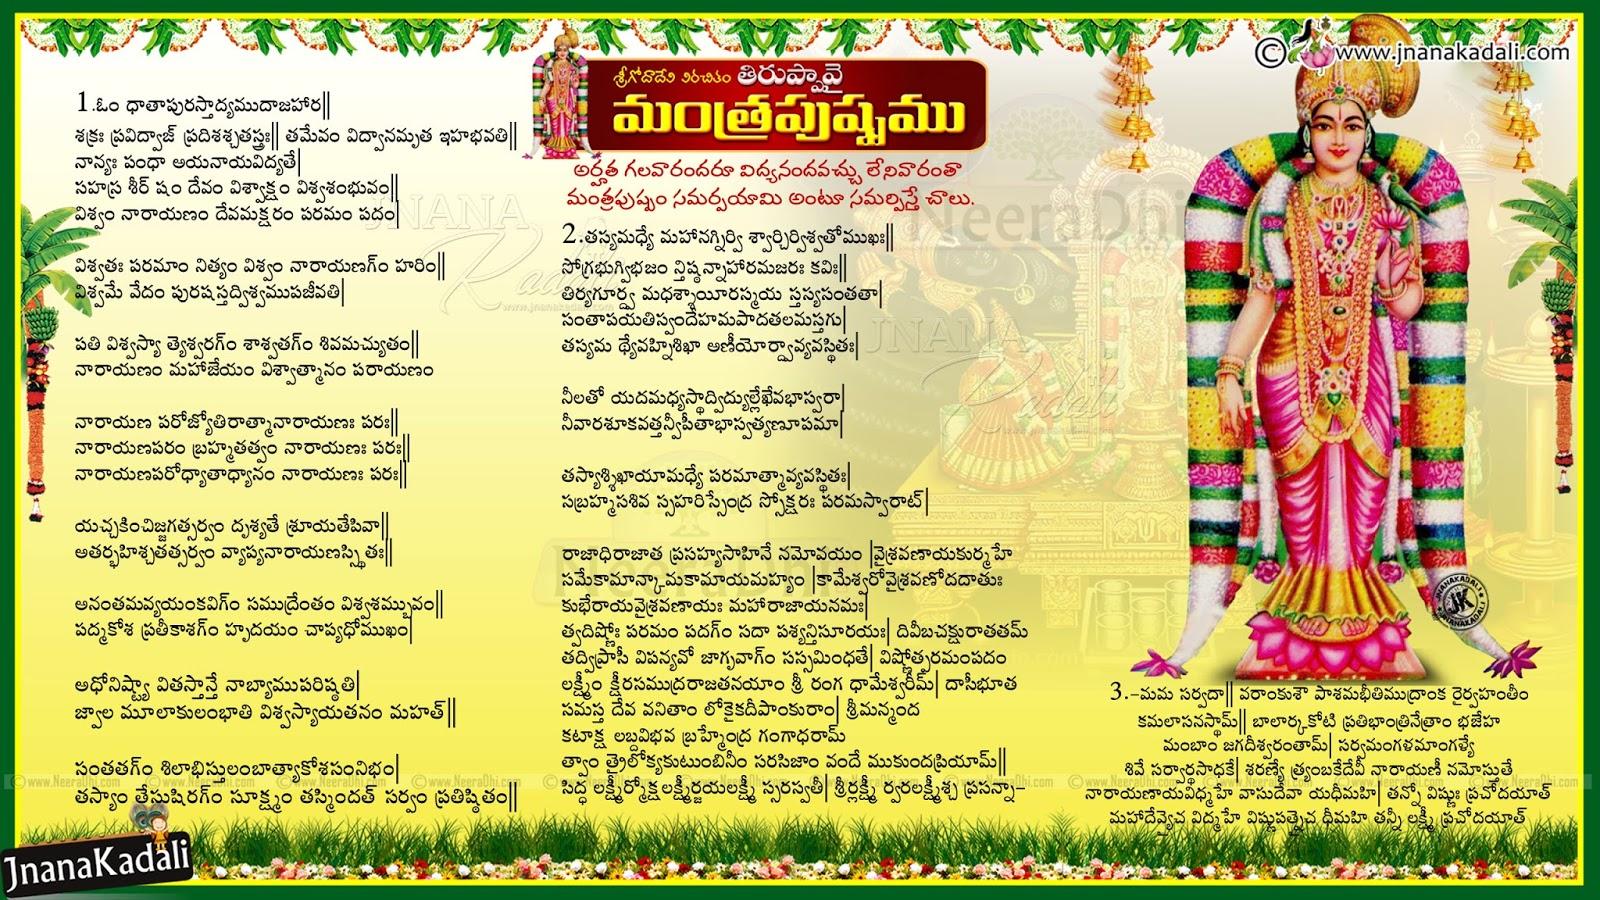 mantra pushpam lyrics in kannada pdf